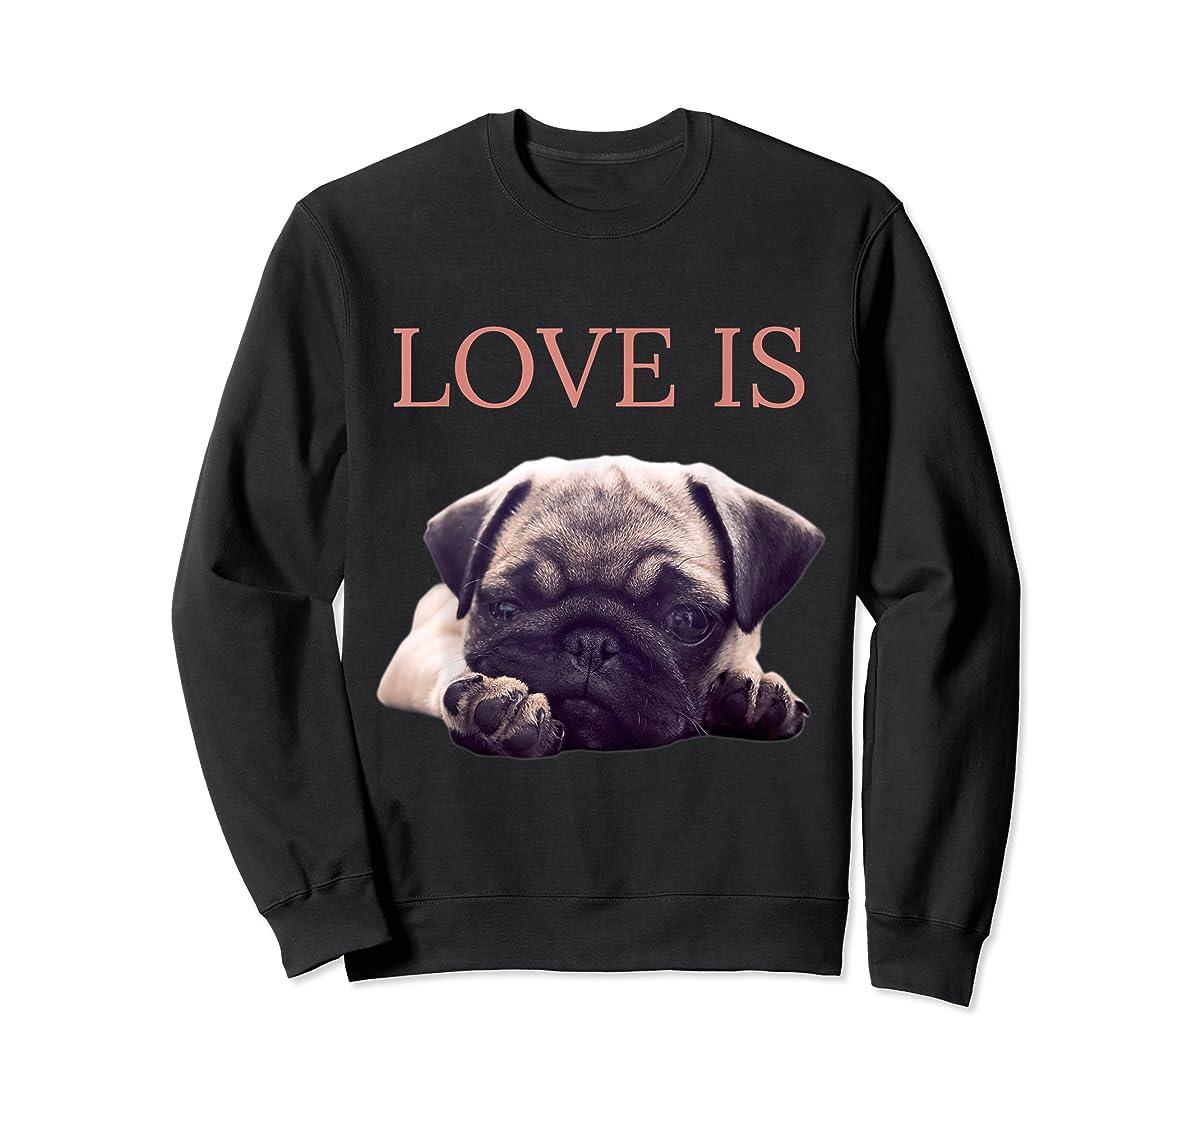 Mothers Day Pug Shirt Women Men Pug Mom Life Tee Love Is Dog-Sweatshirt-Black